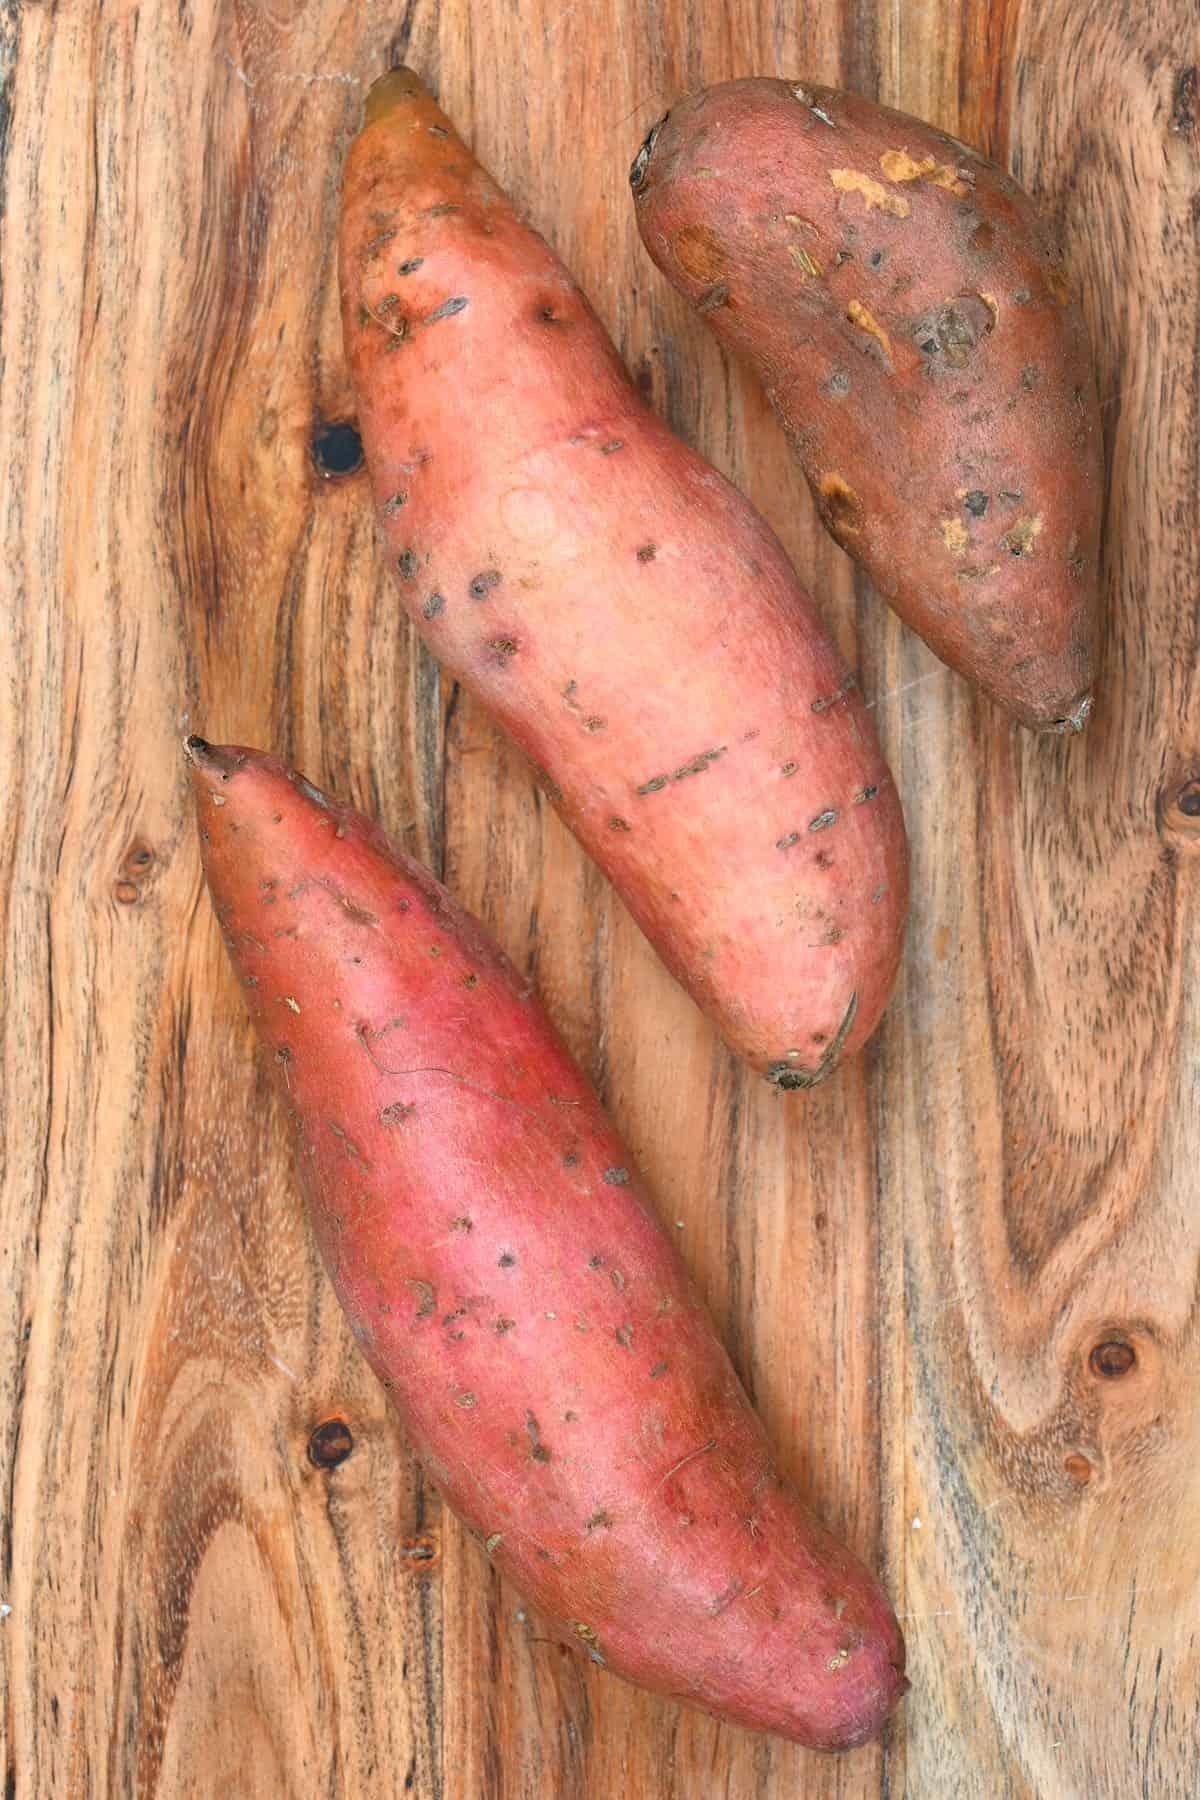 Three sweet potatoes on a wooden board